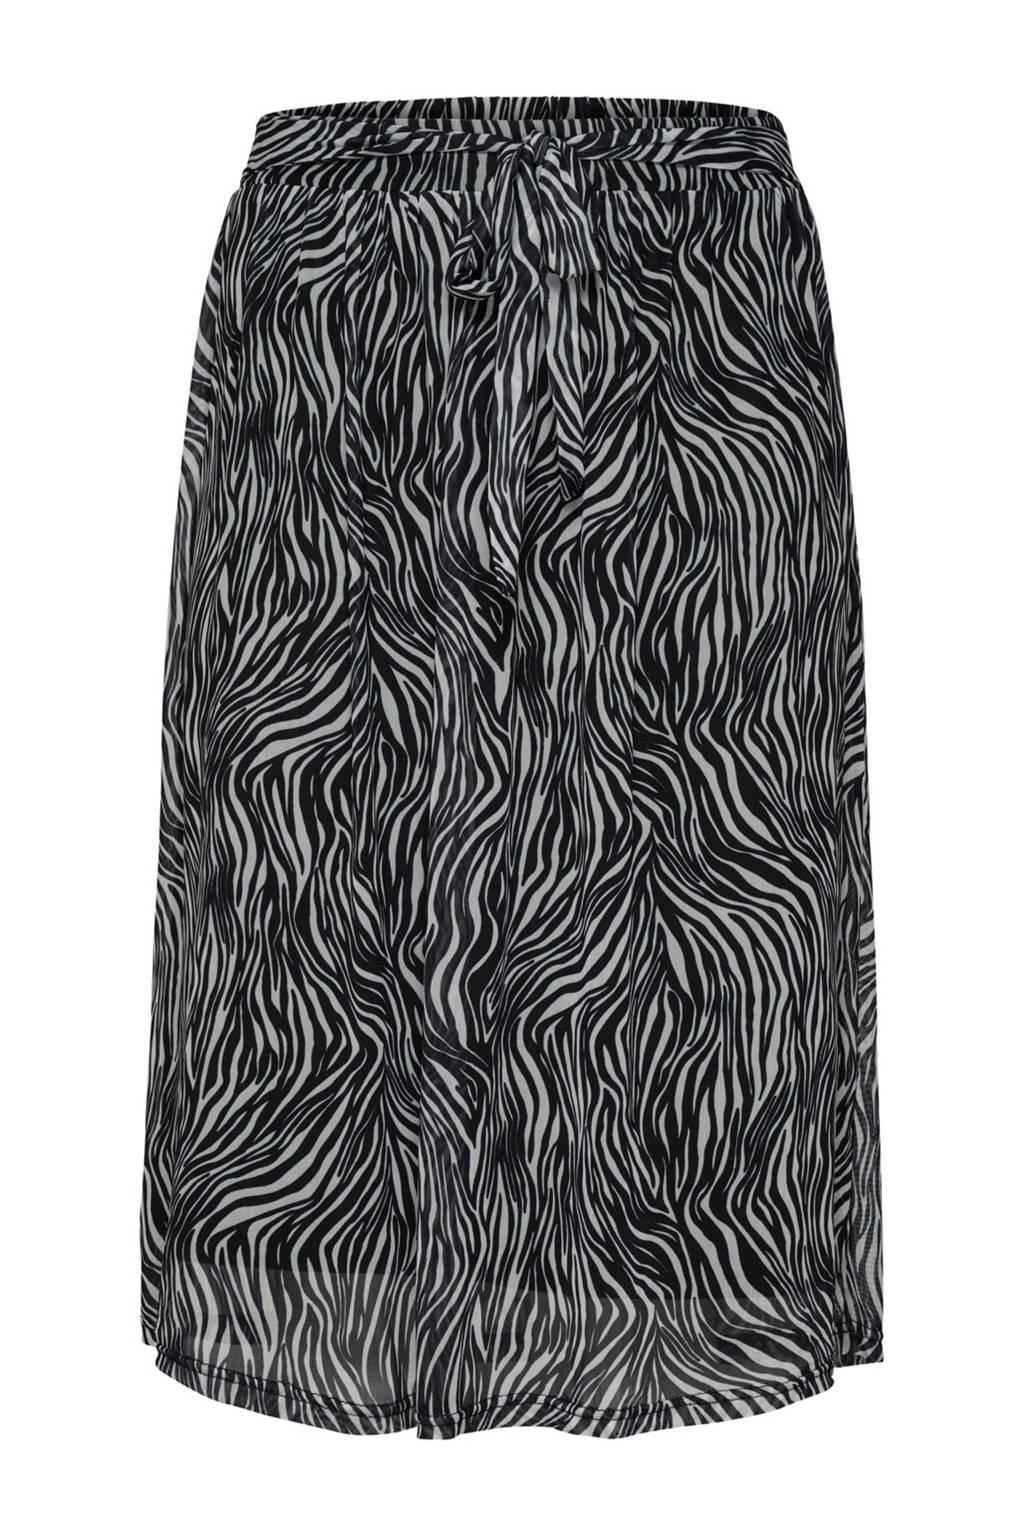 ONLY carmakoma rok met zebraprint, Zwart/wit